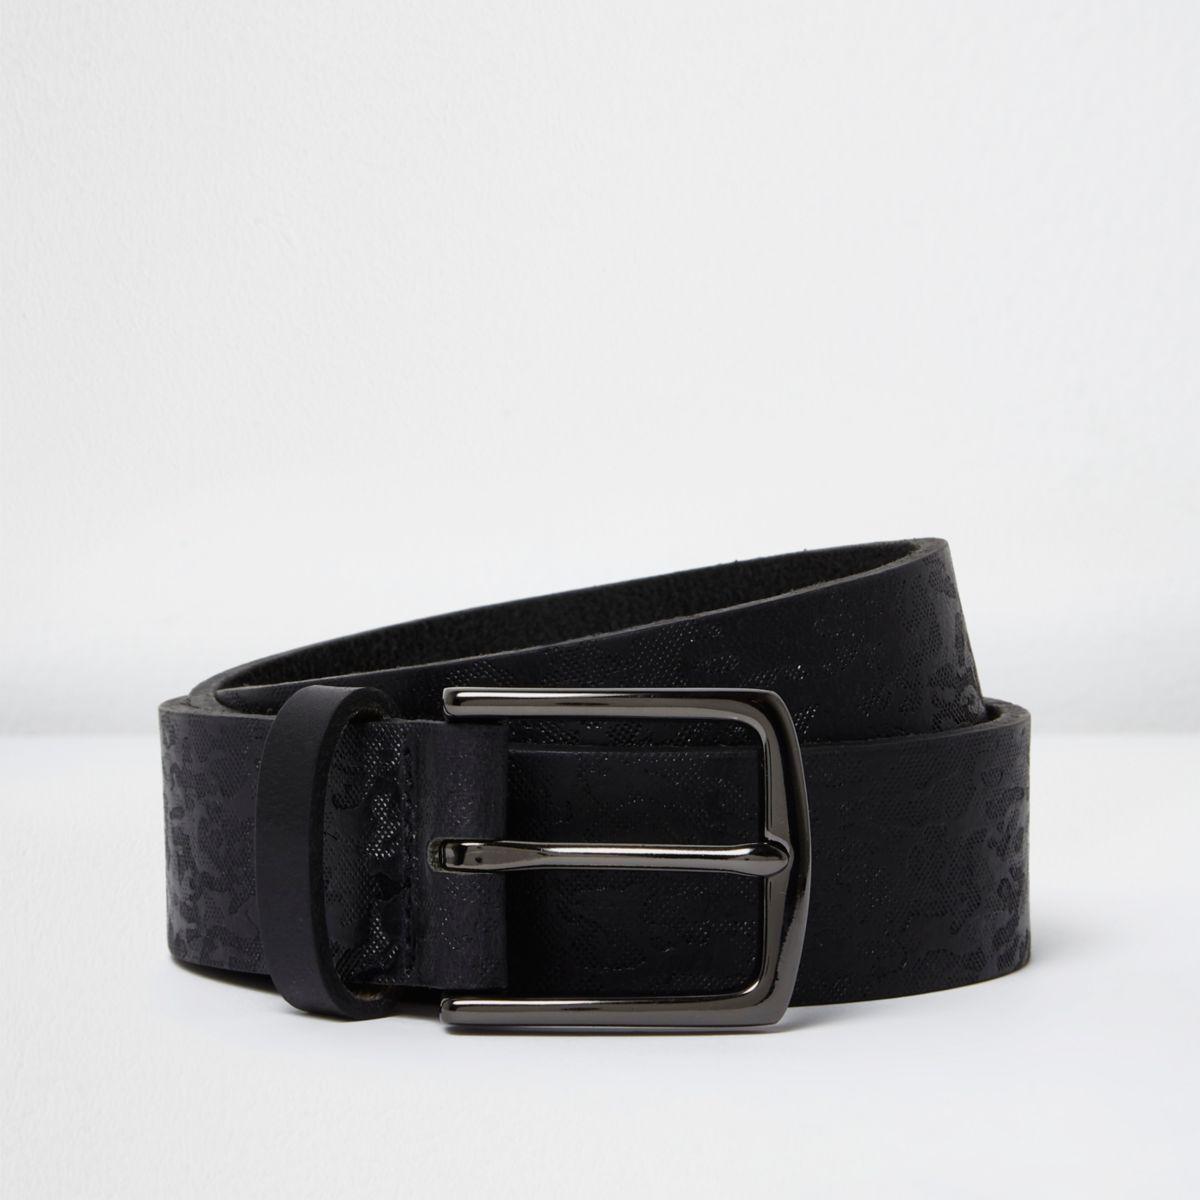 Black camo imprint leather belt